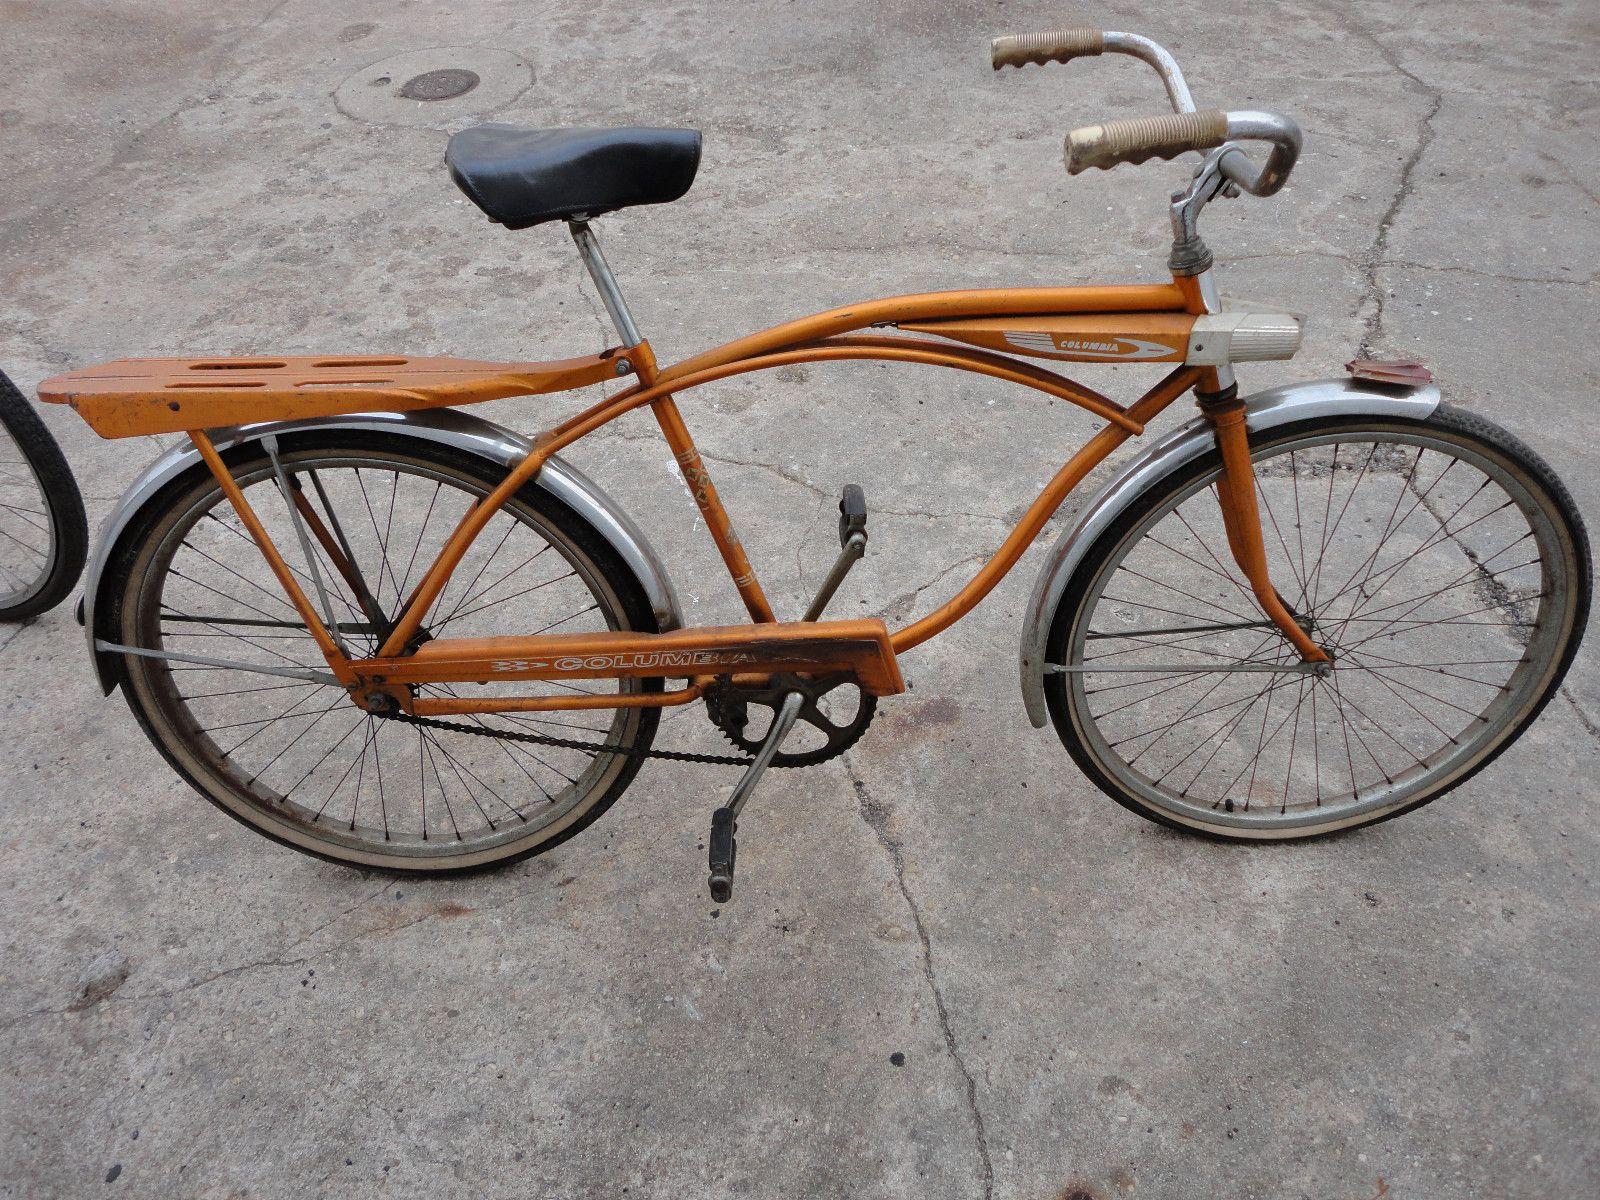 Vintage Columbia Bicycle Retro Ratrod Scta Williamsburg Bicycle Rat Rod Vintage Bikes